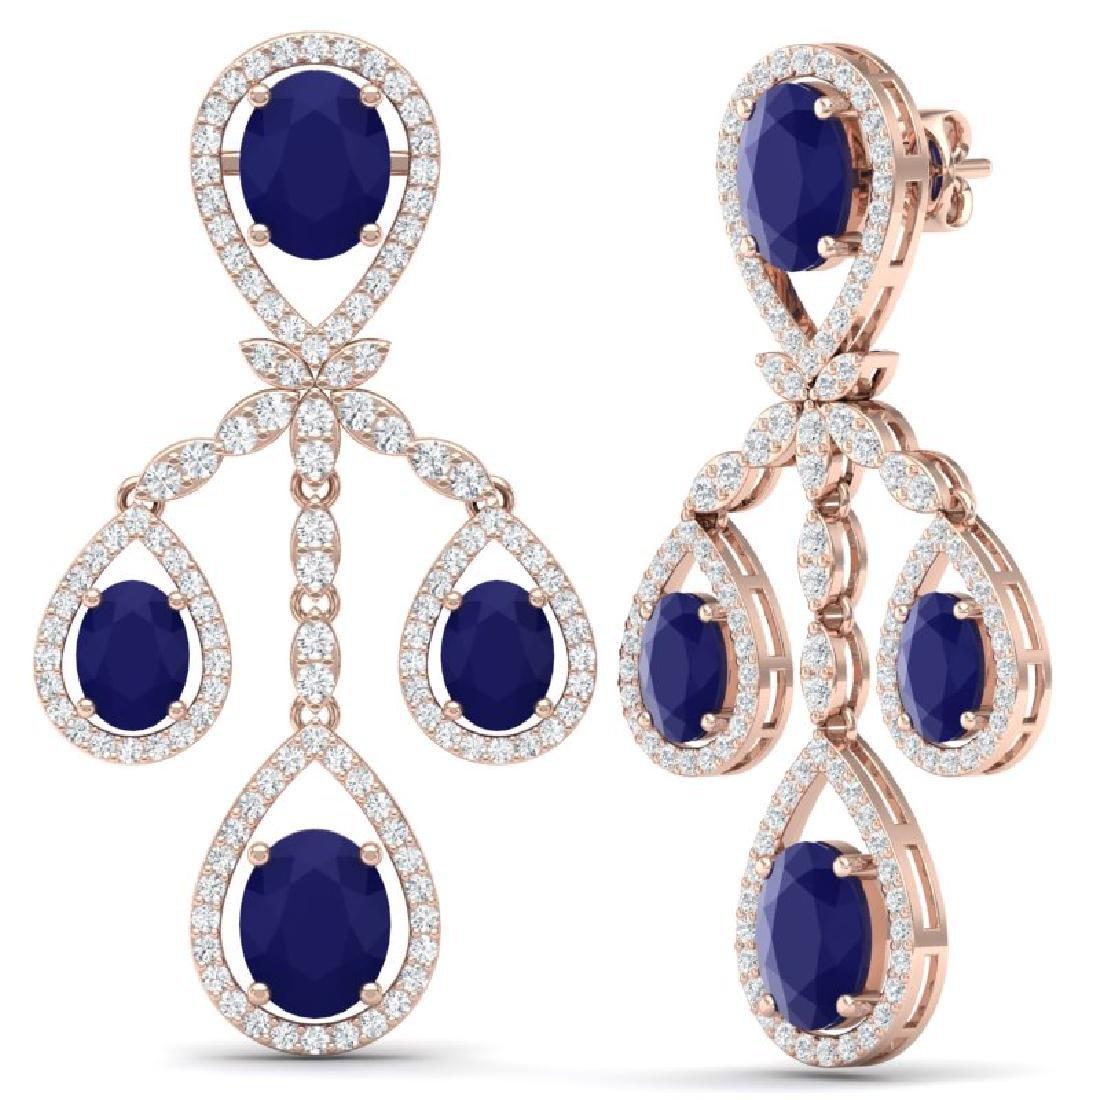 25.08 CTW Royalty Sapphire & VS Diamond Earrings 18K - 3